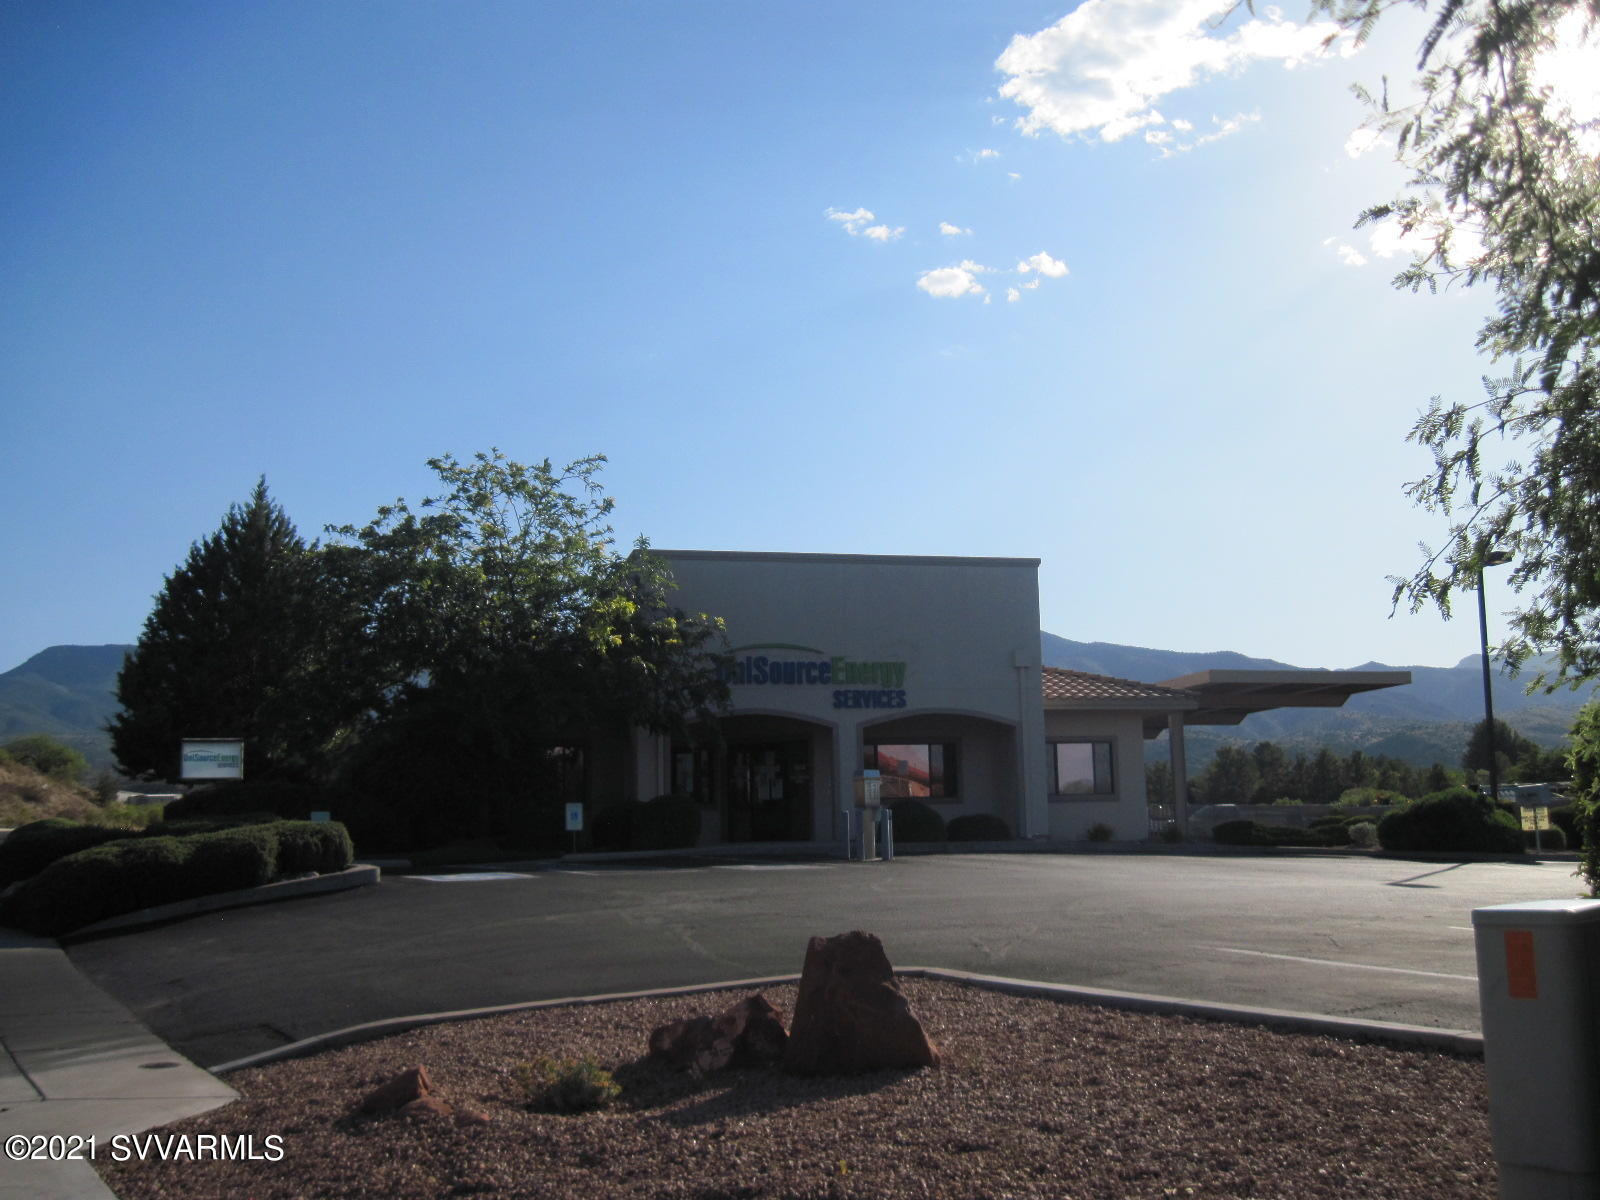 500 S Willard St Cottonwood, AZ 86326